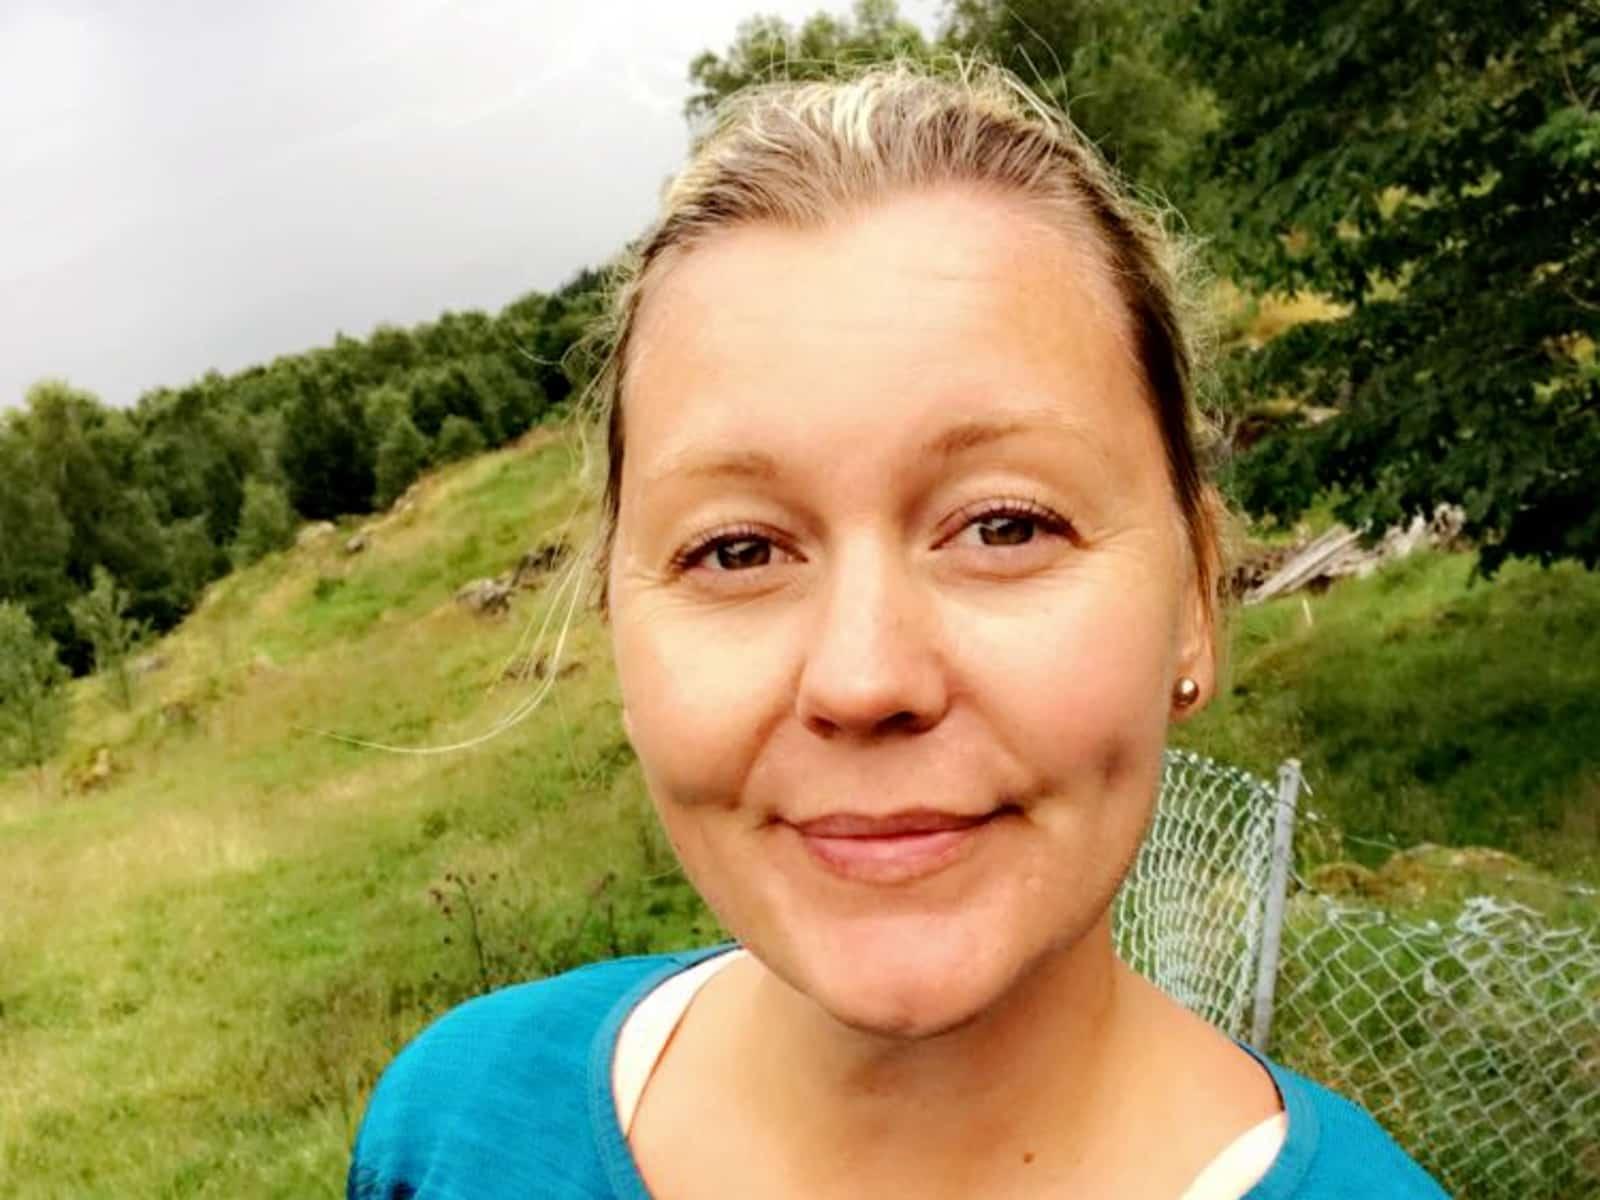 Anne marie from Stavanger, Norway